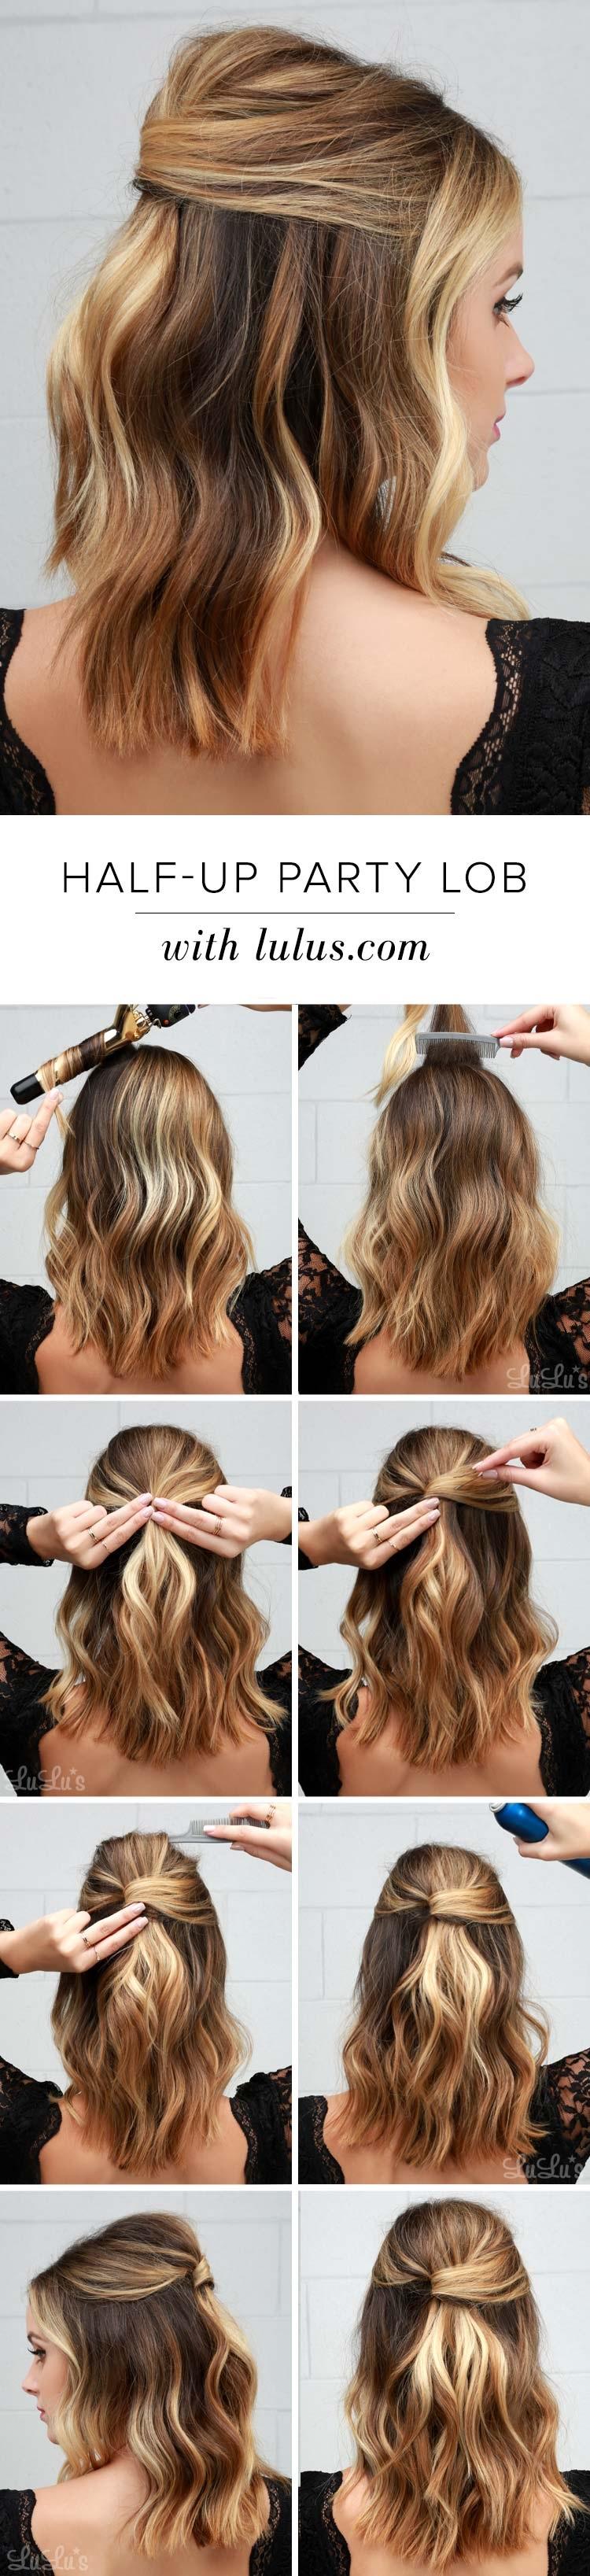 tuto-cheveux mi-longs22